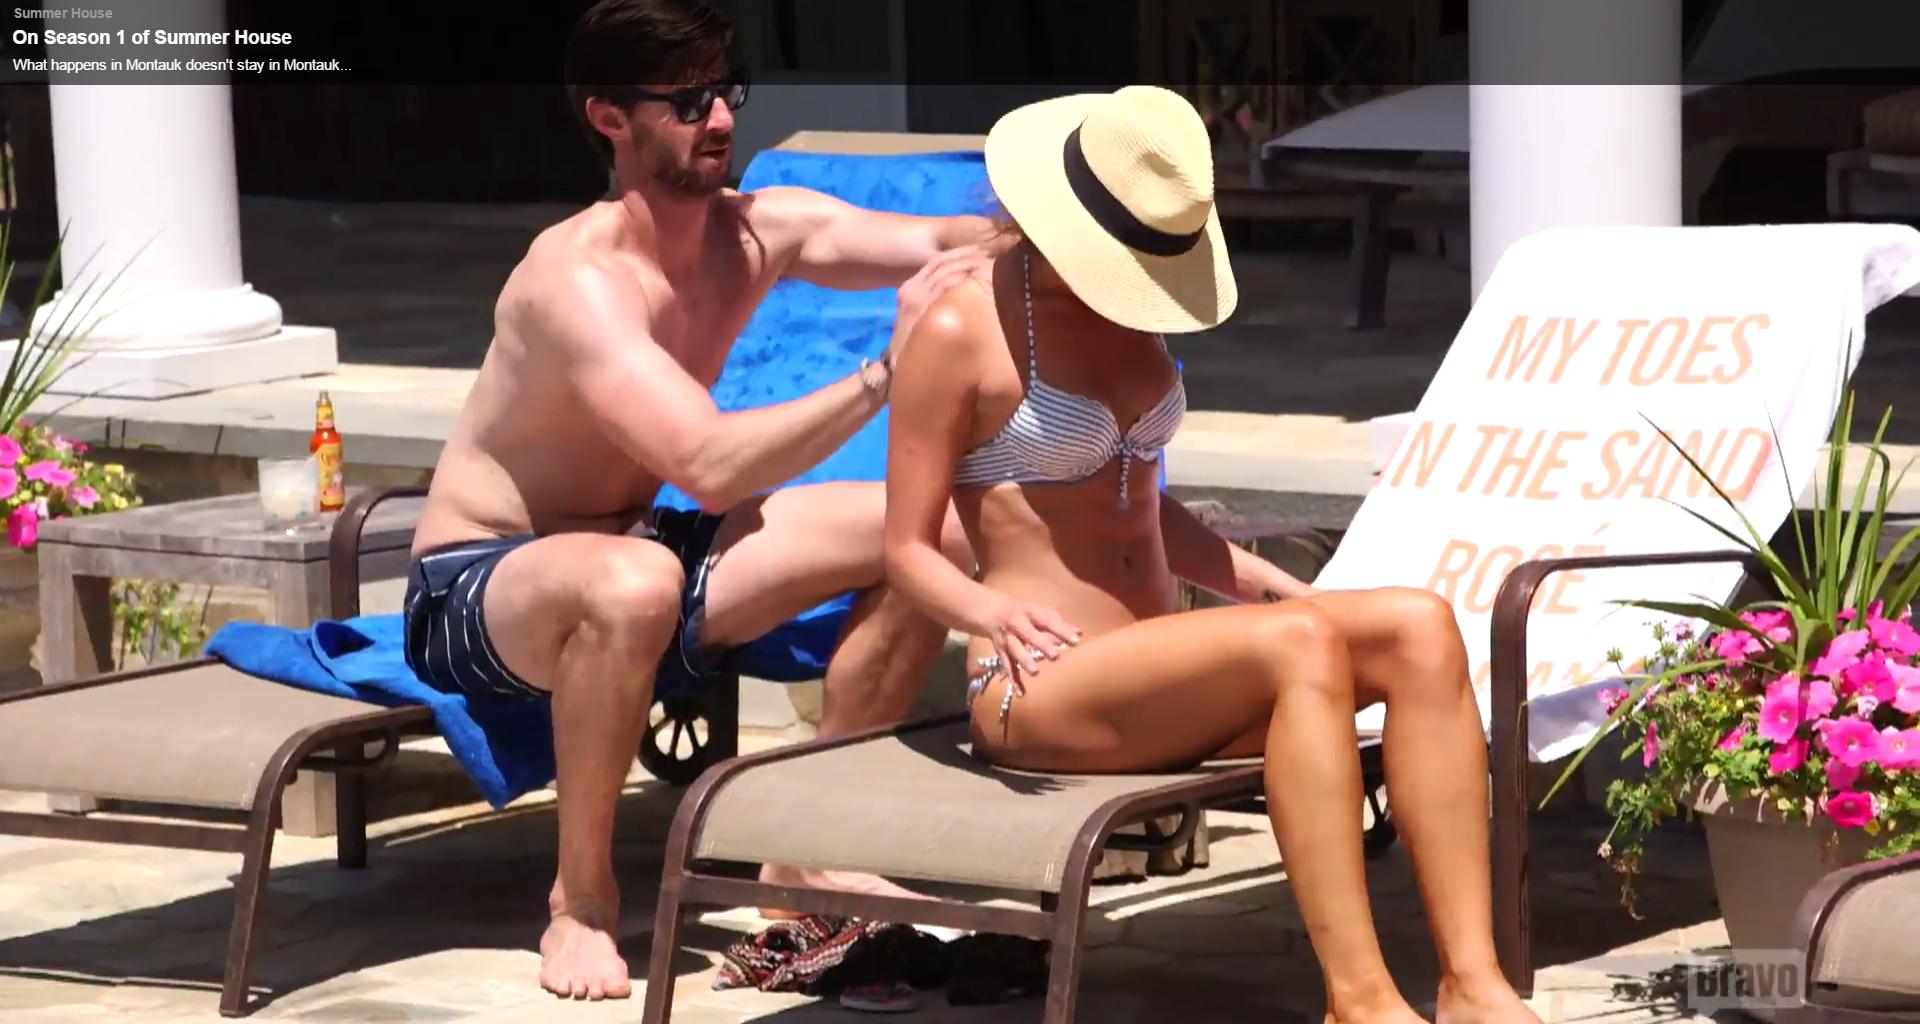 beach towel as seen on bravo tv